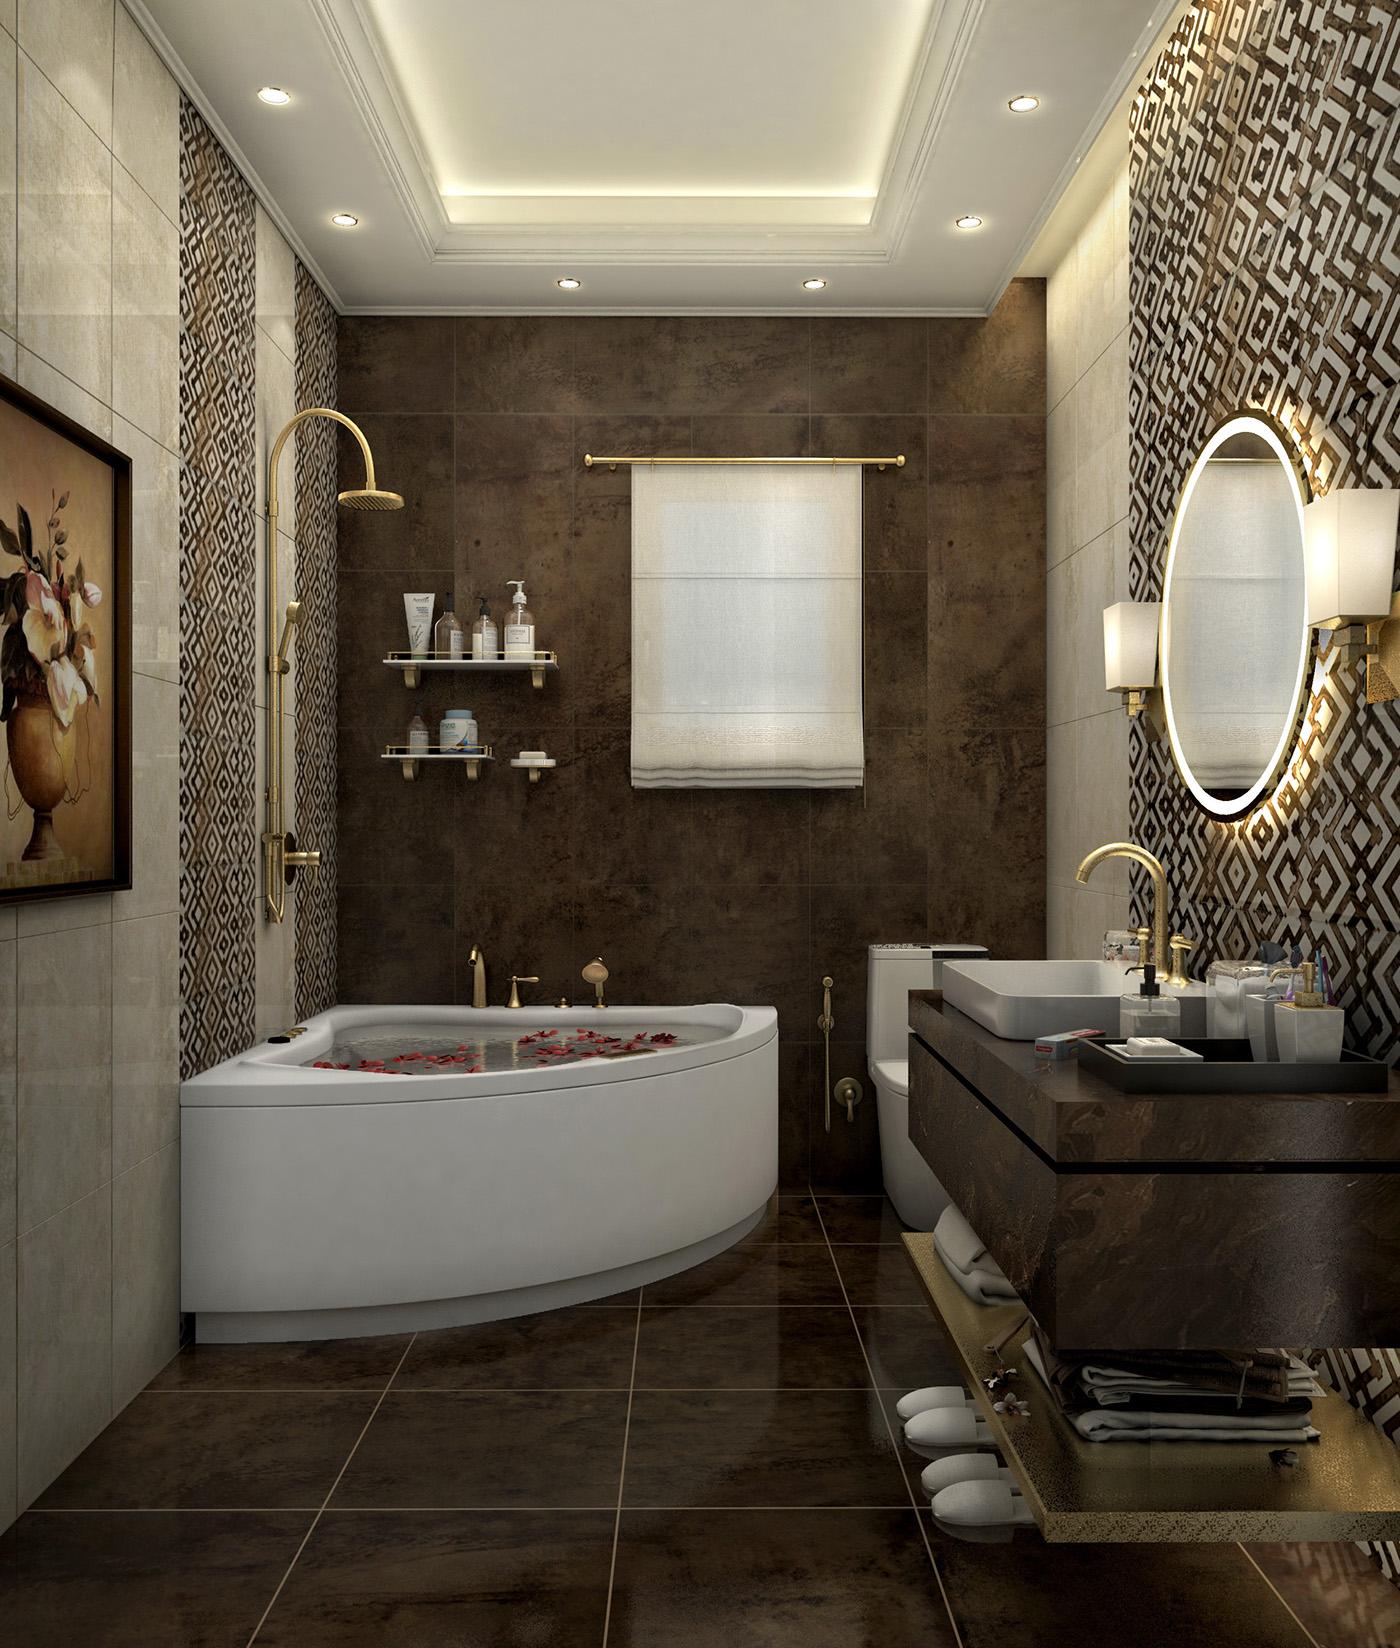 Apartment Bathroom Interior Design Master Bathroom Ideas: Solik Apartment On Behance